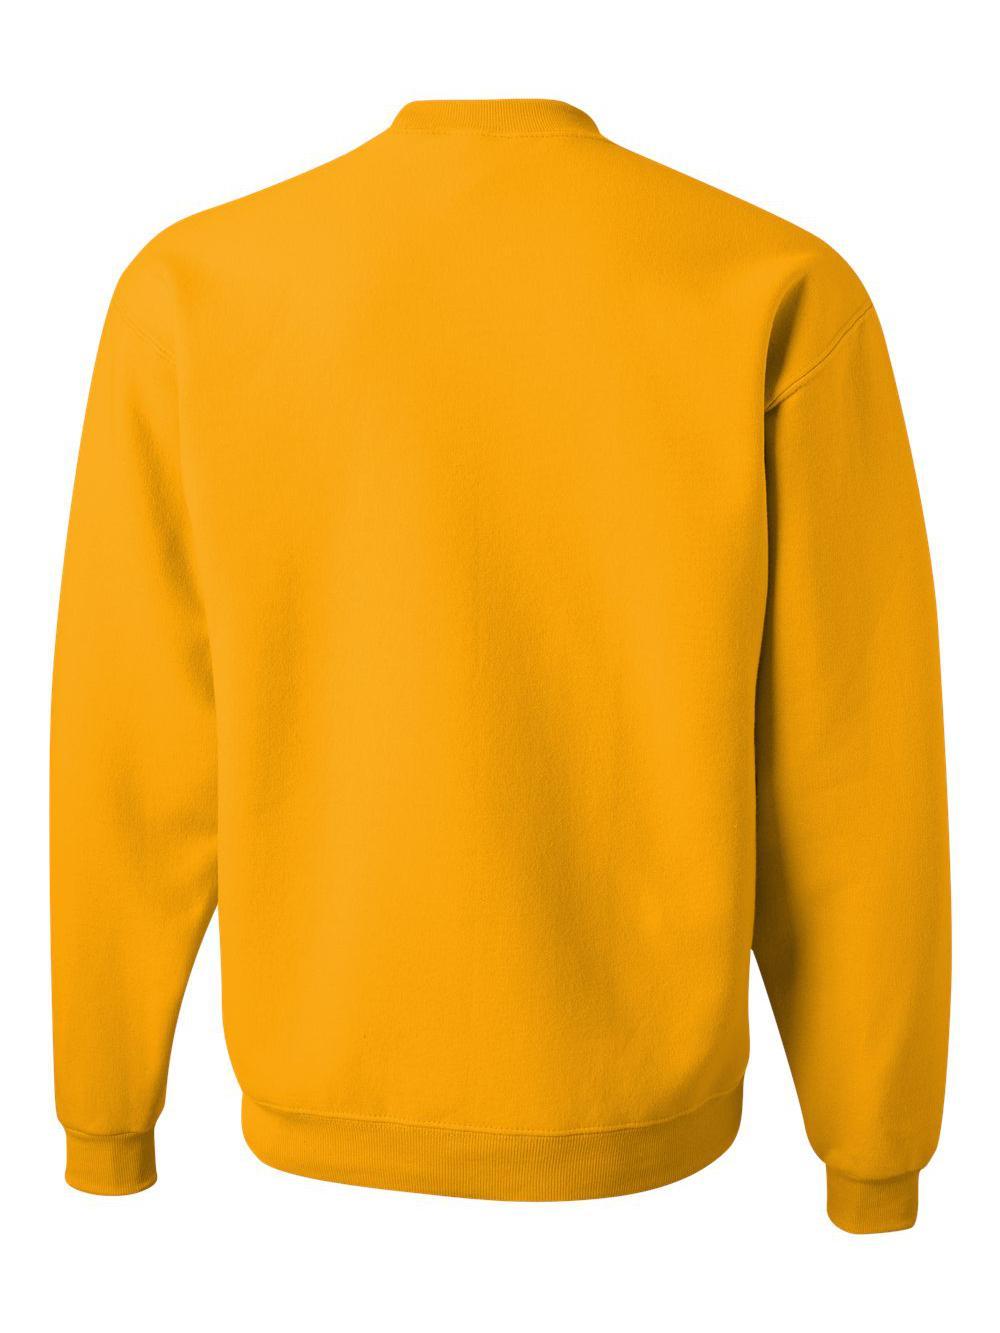 Jerzees-NuBlend-Crewneck-Sweatshirt-562MR thumbnail 43